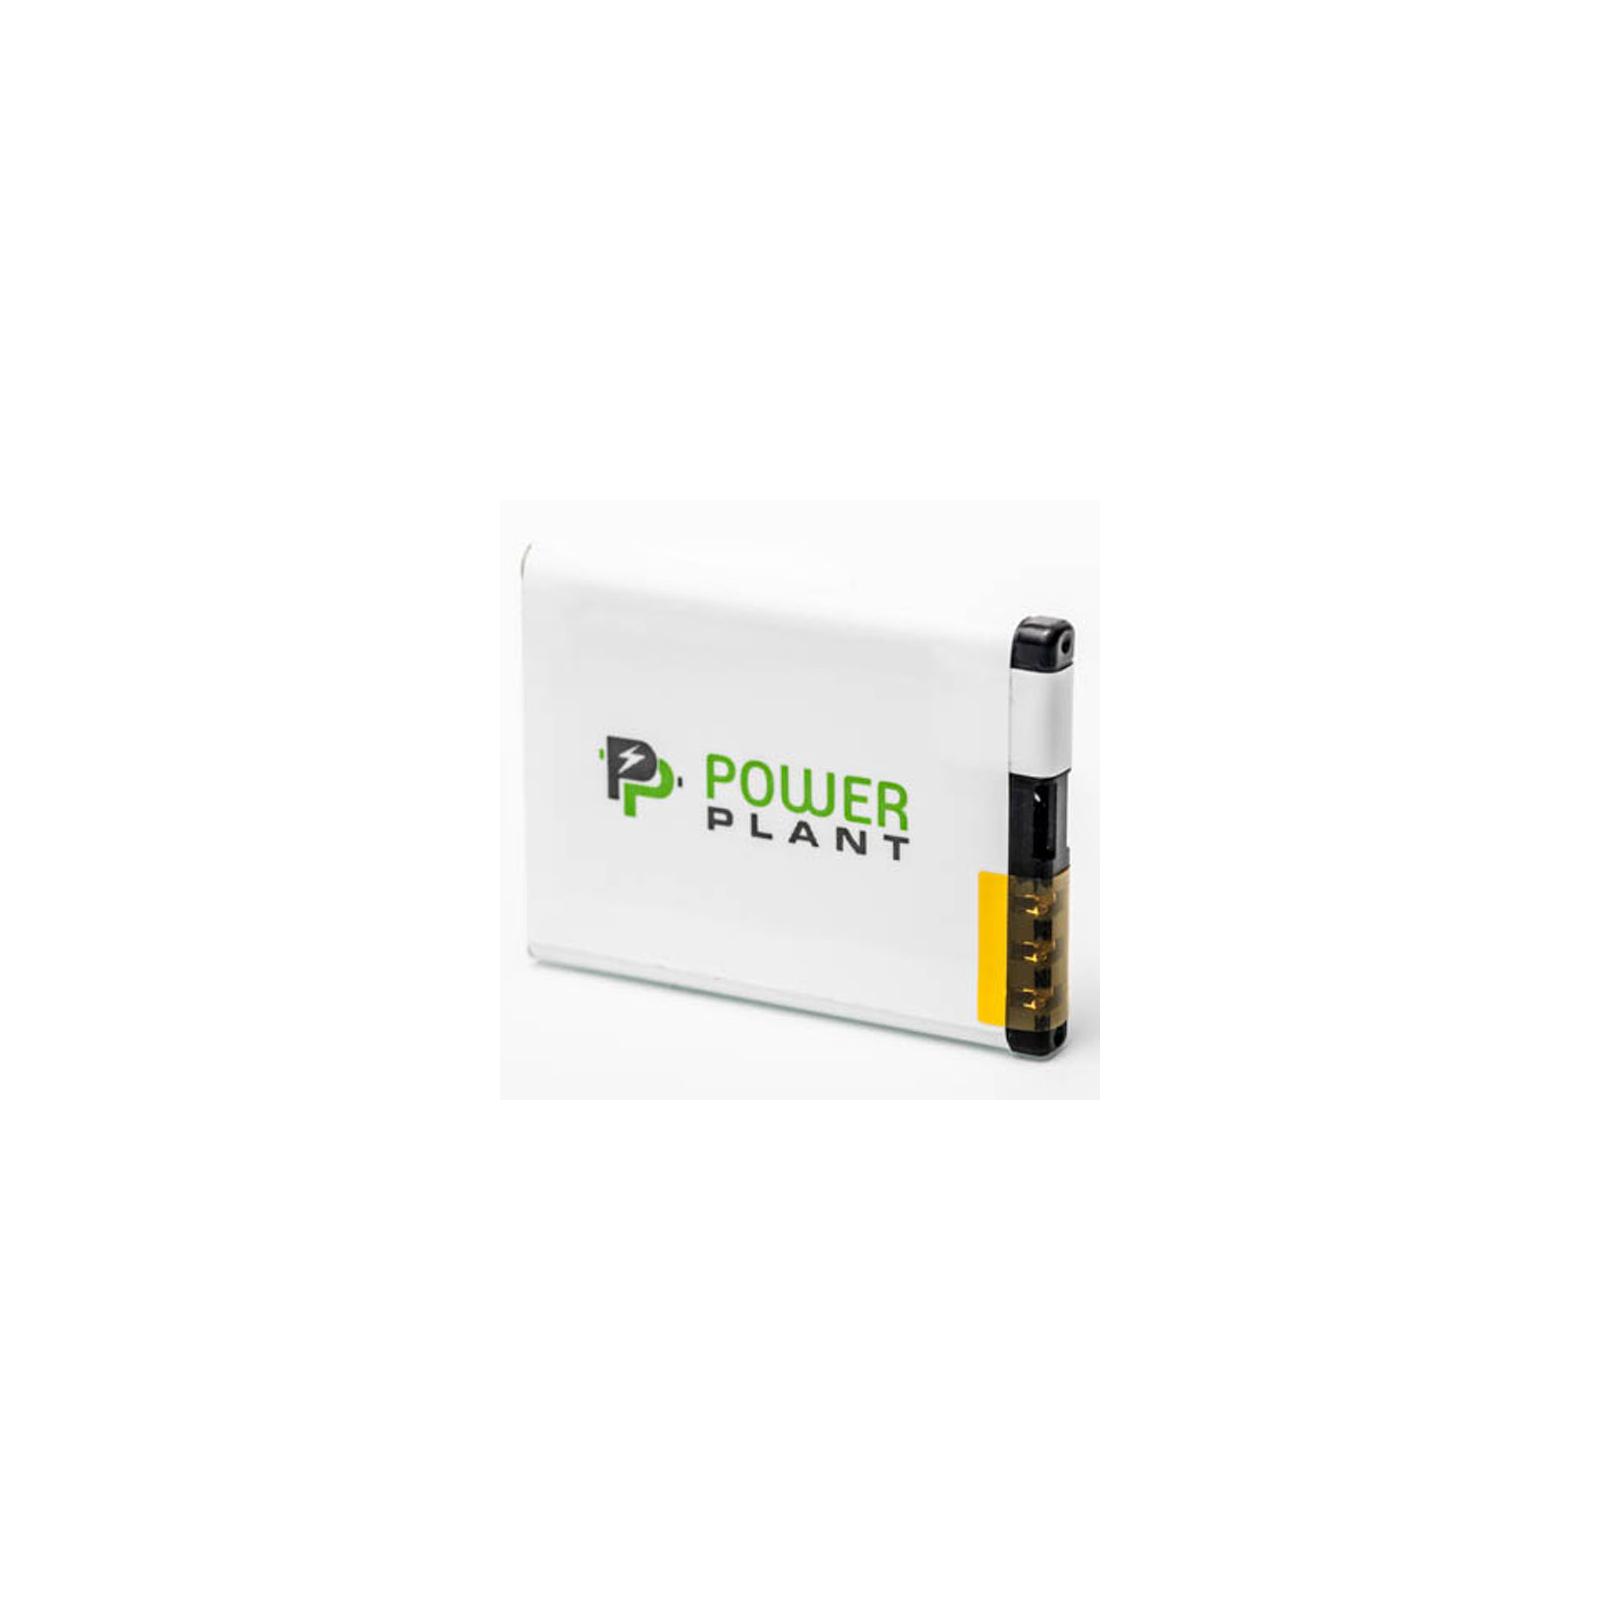 Аккумуляторная батарея PowerPlant Nokia BL-4B (6111, 6230, 7370) (DV00DV1188) изображение 2